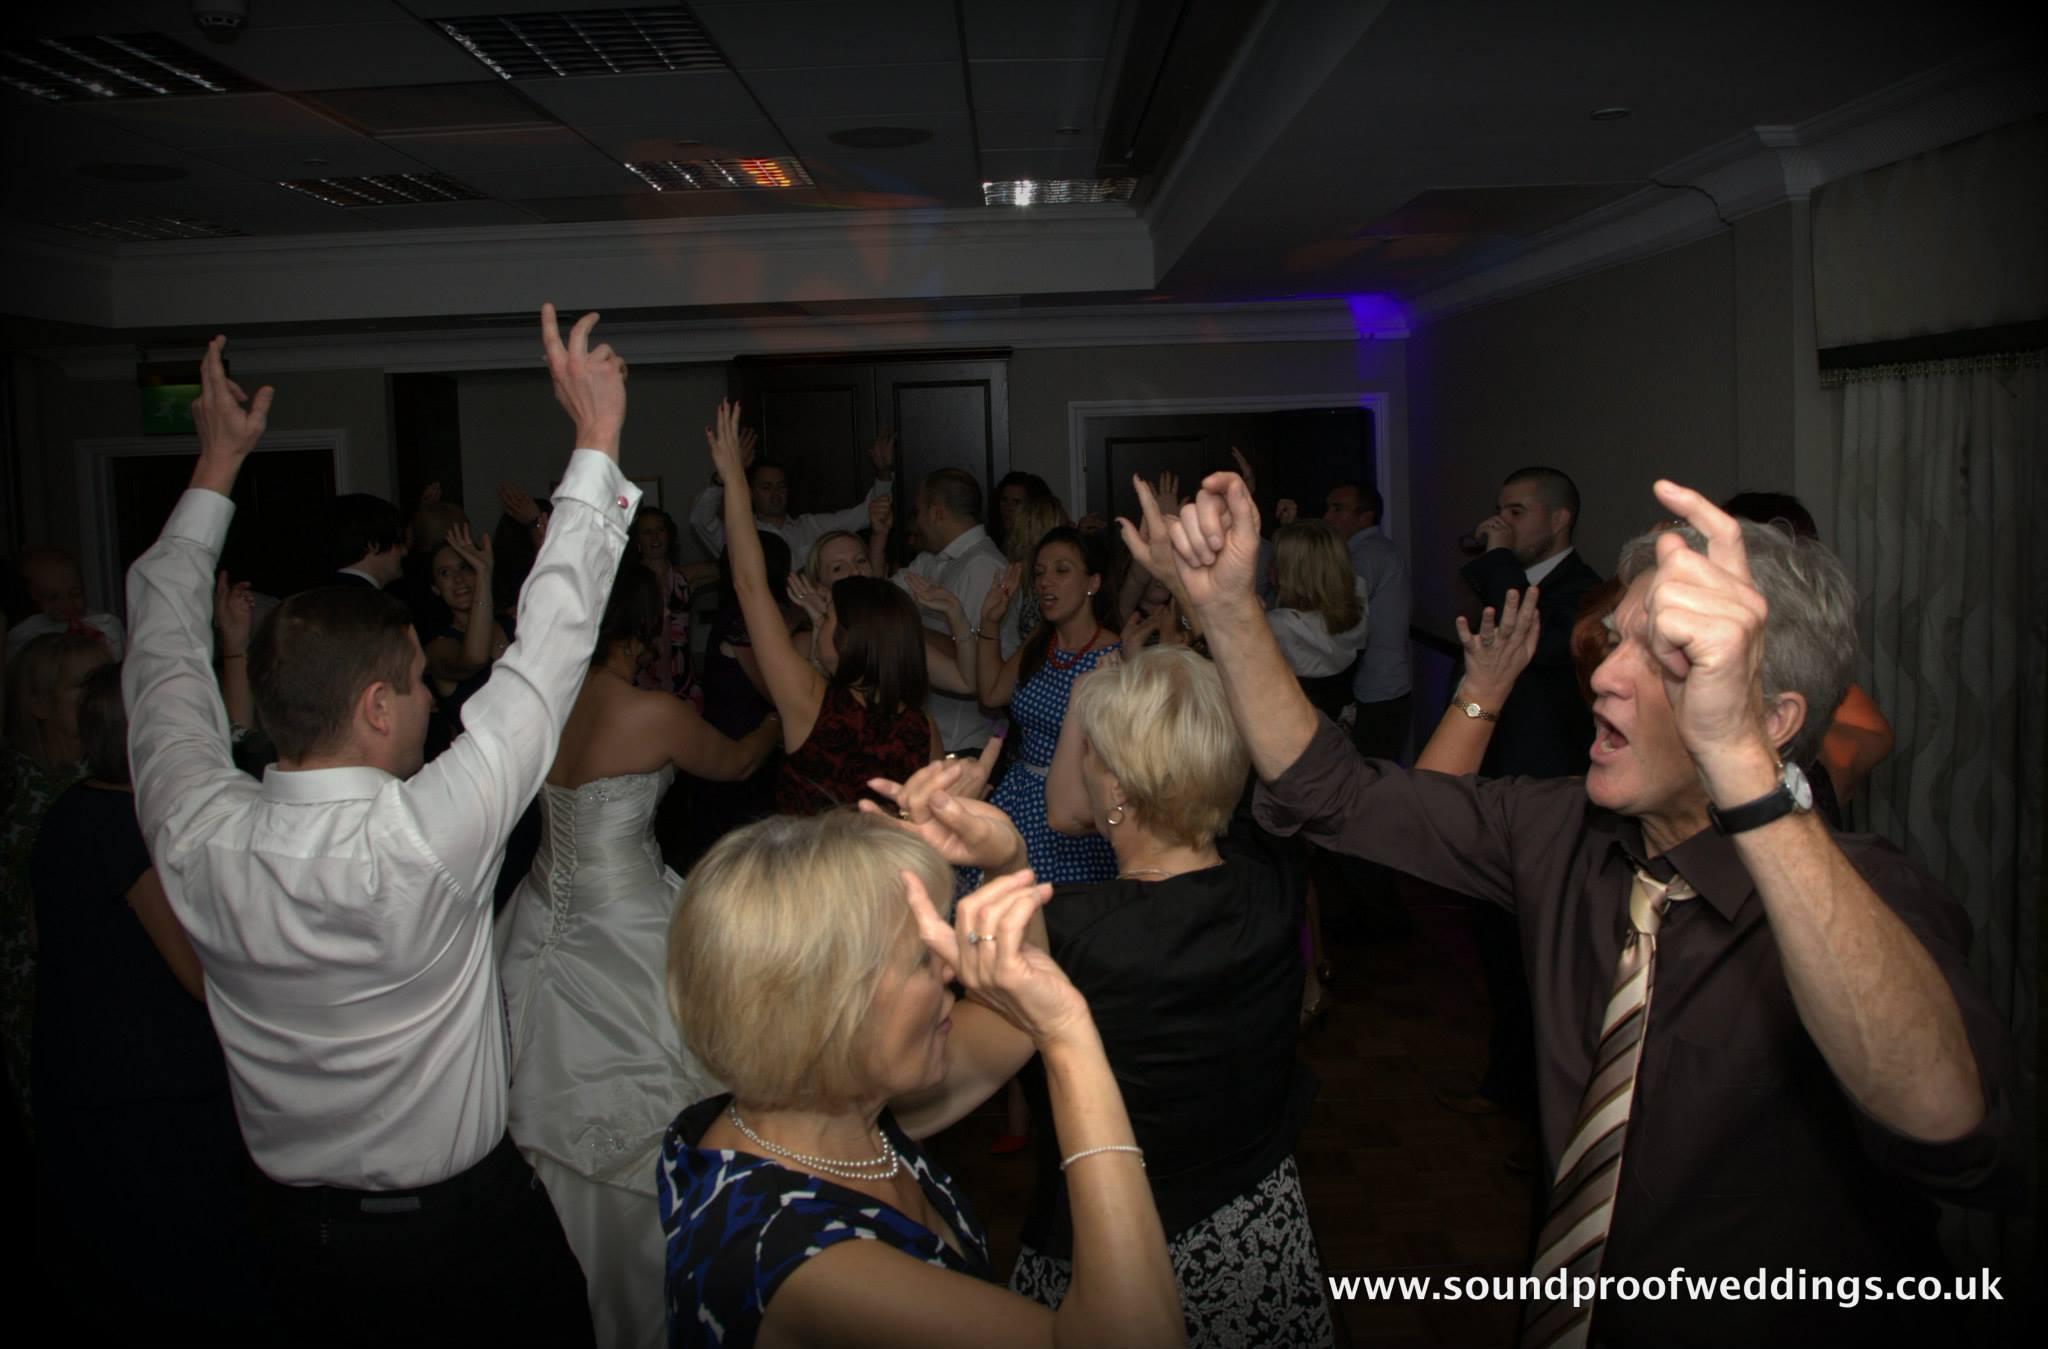 Gemma & Philip – St Annes Manor Hilton – Wokingham, Berkshire, 28/9/2013